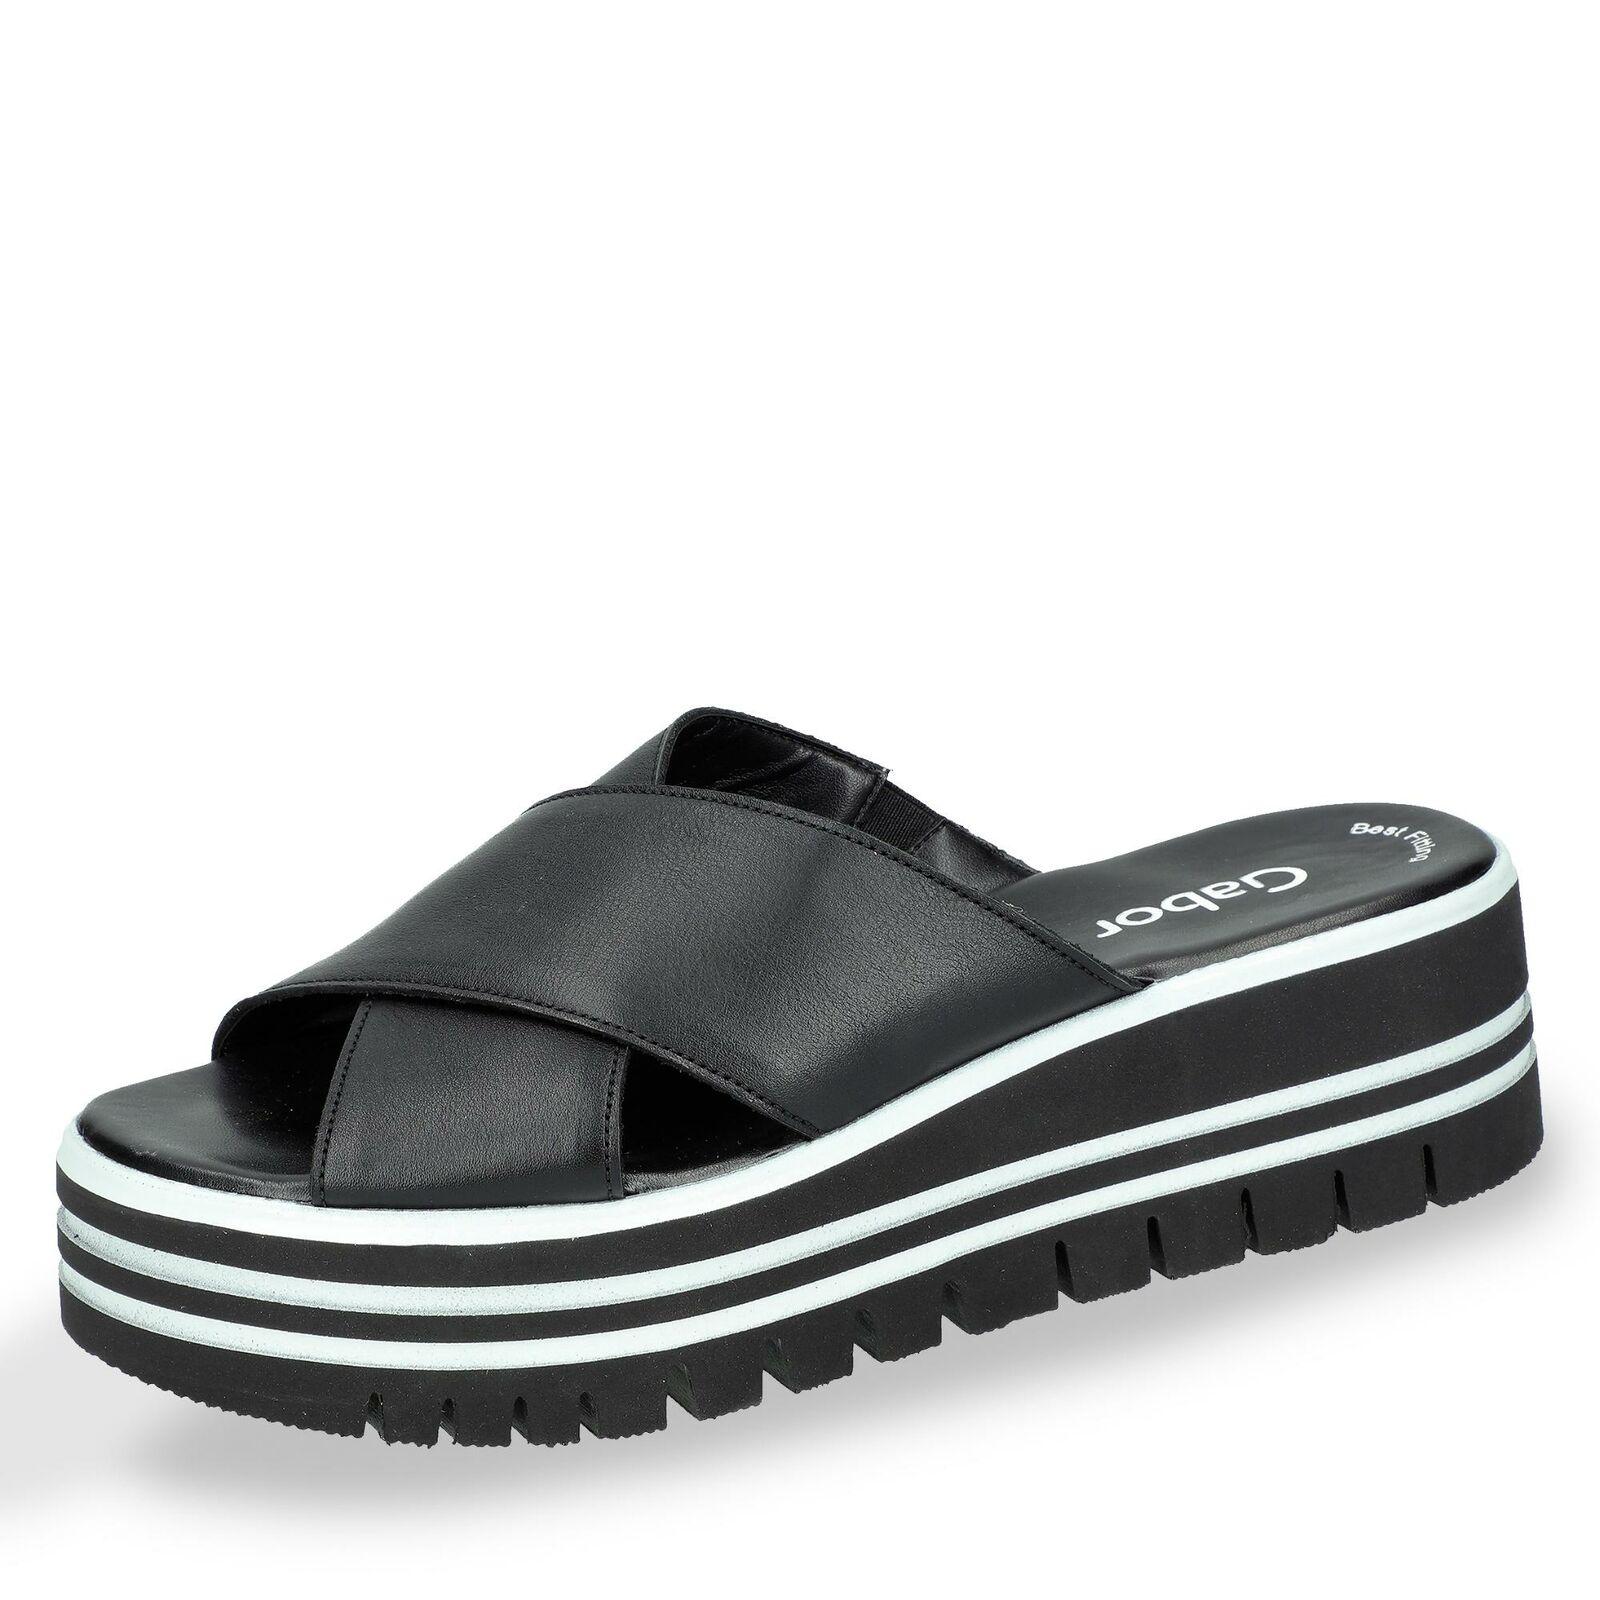 Gabor Damen Pantolette Slipper Schlupfschuhe Sommerschuhe Sommer Schuhe schwarz